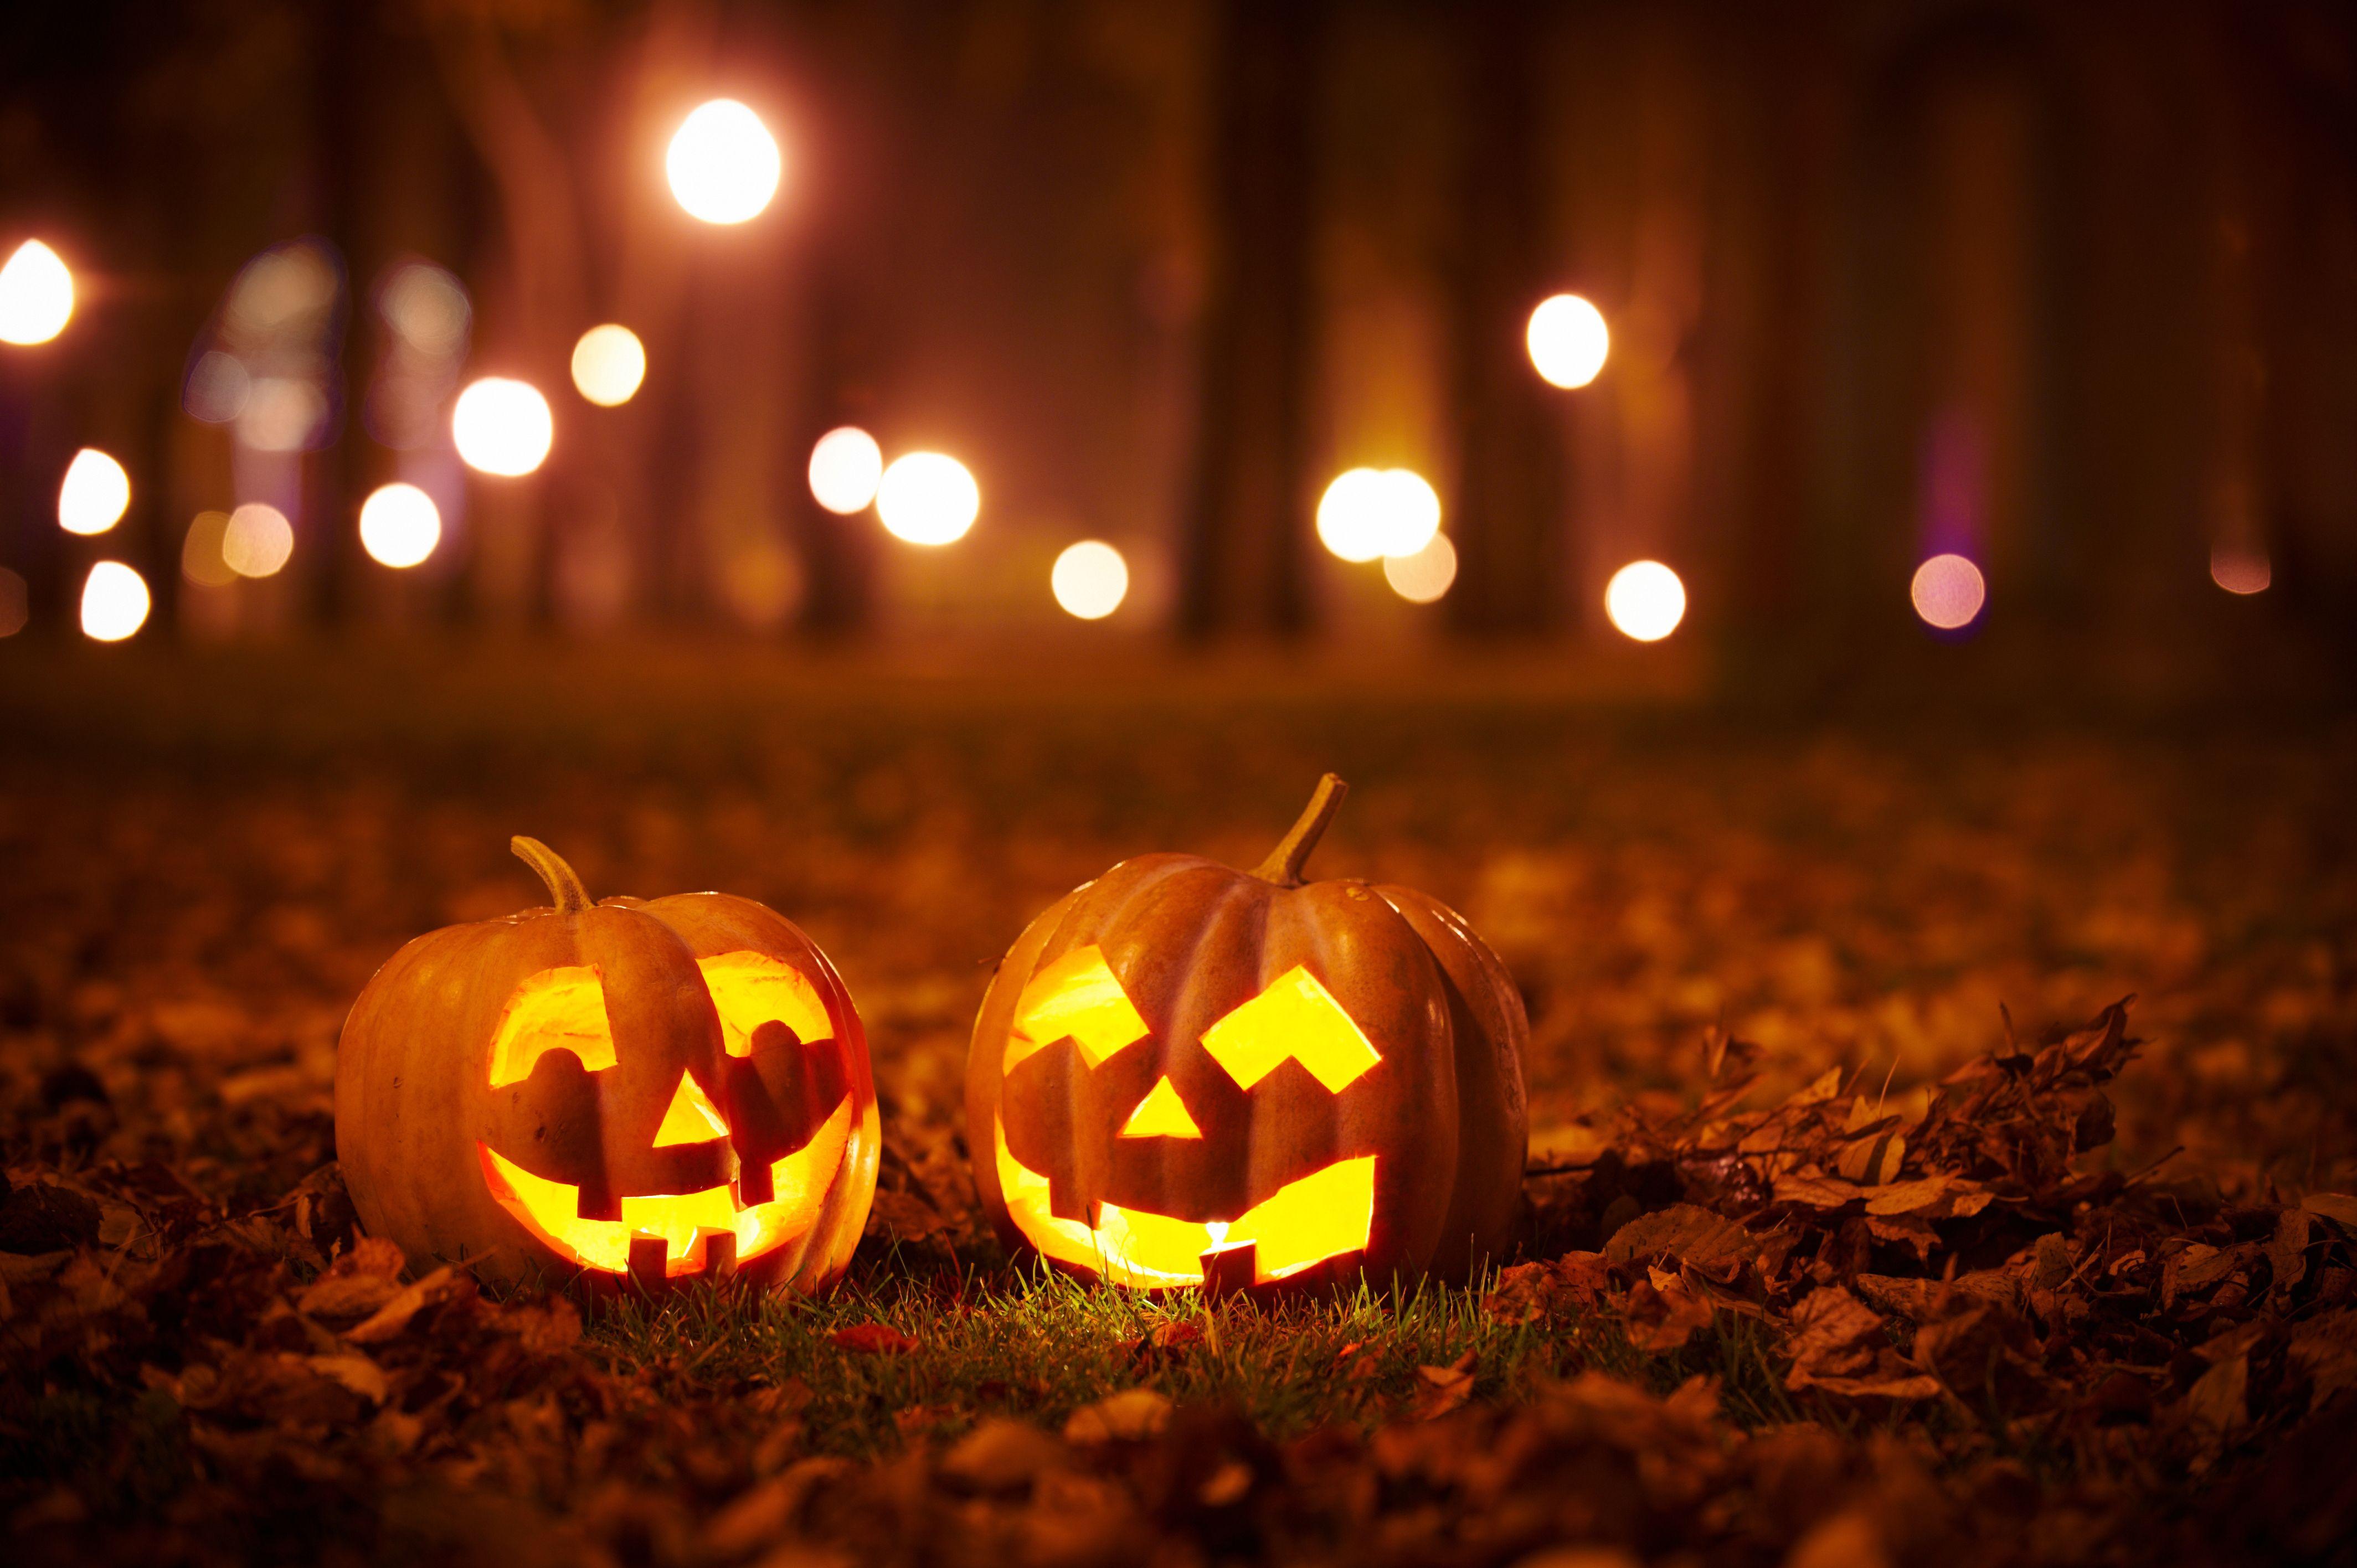 Ventura Halloween Events 2020 Ventura County Bans Most Halloween Events Over Coronavirus Safety